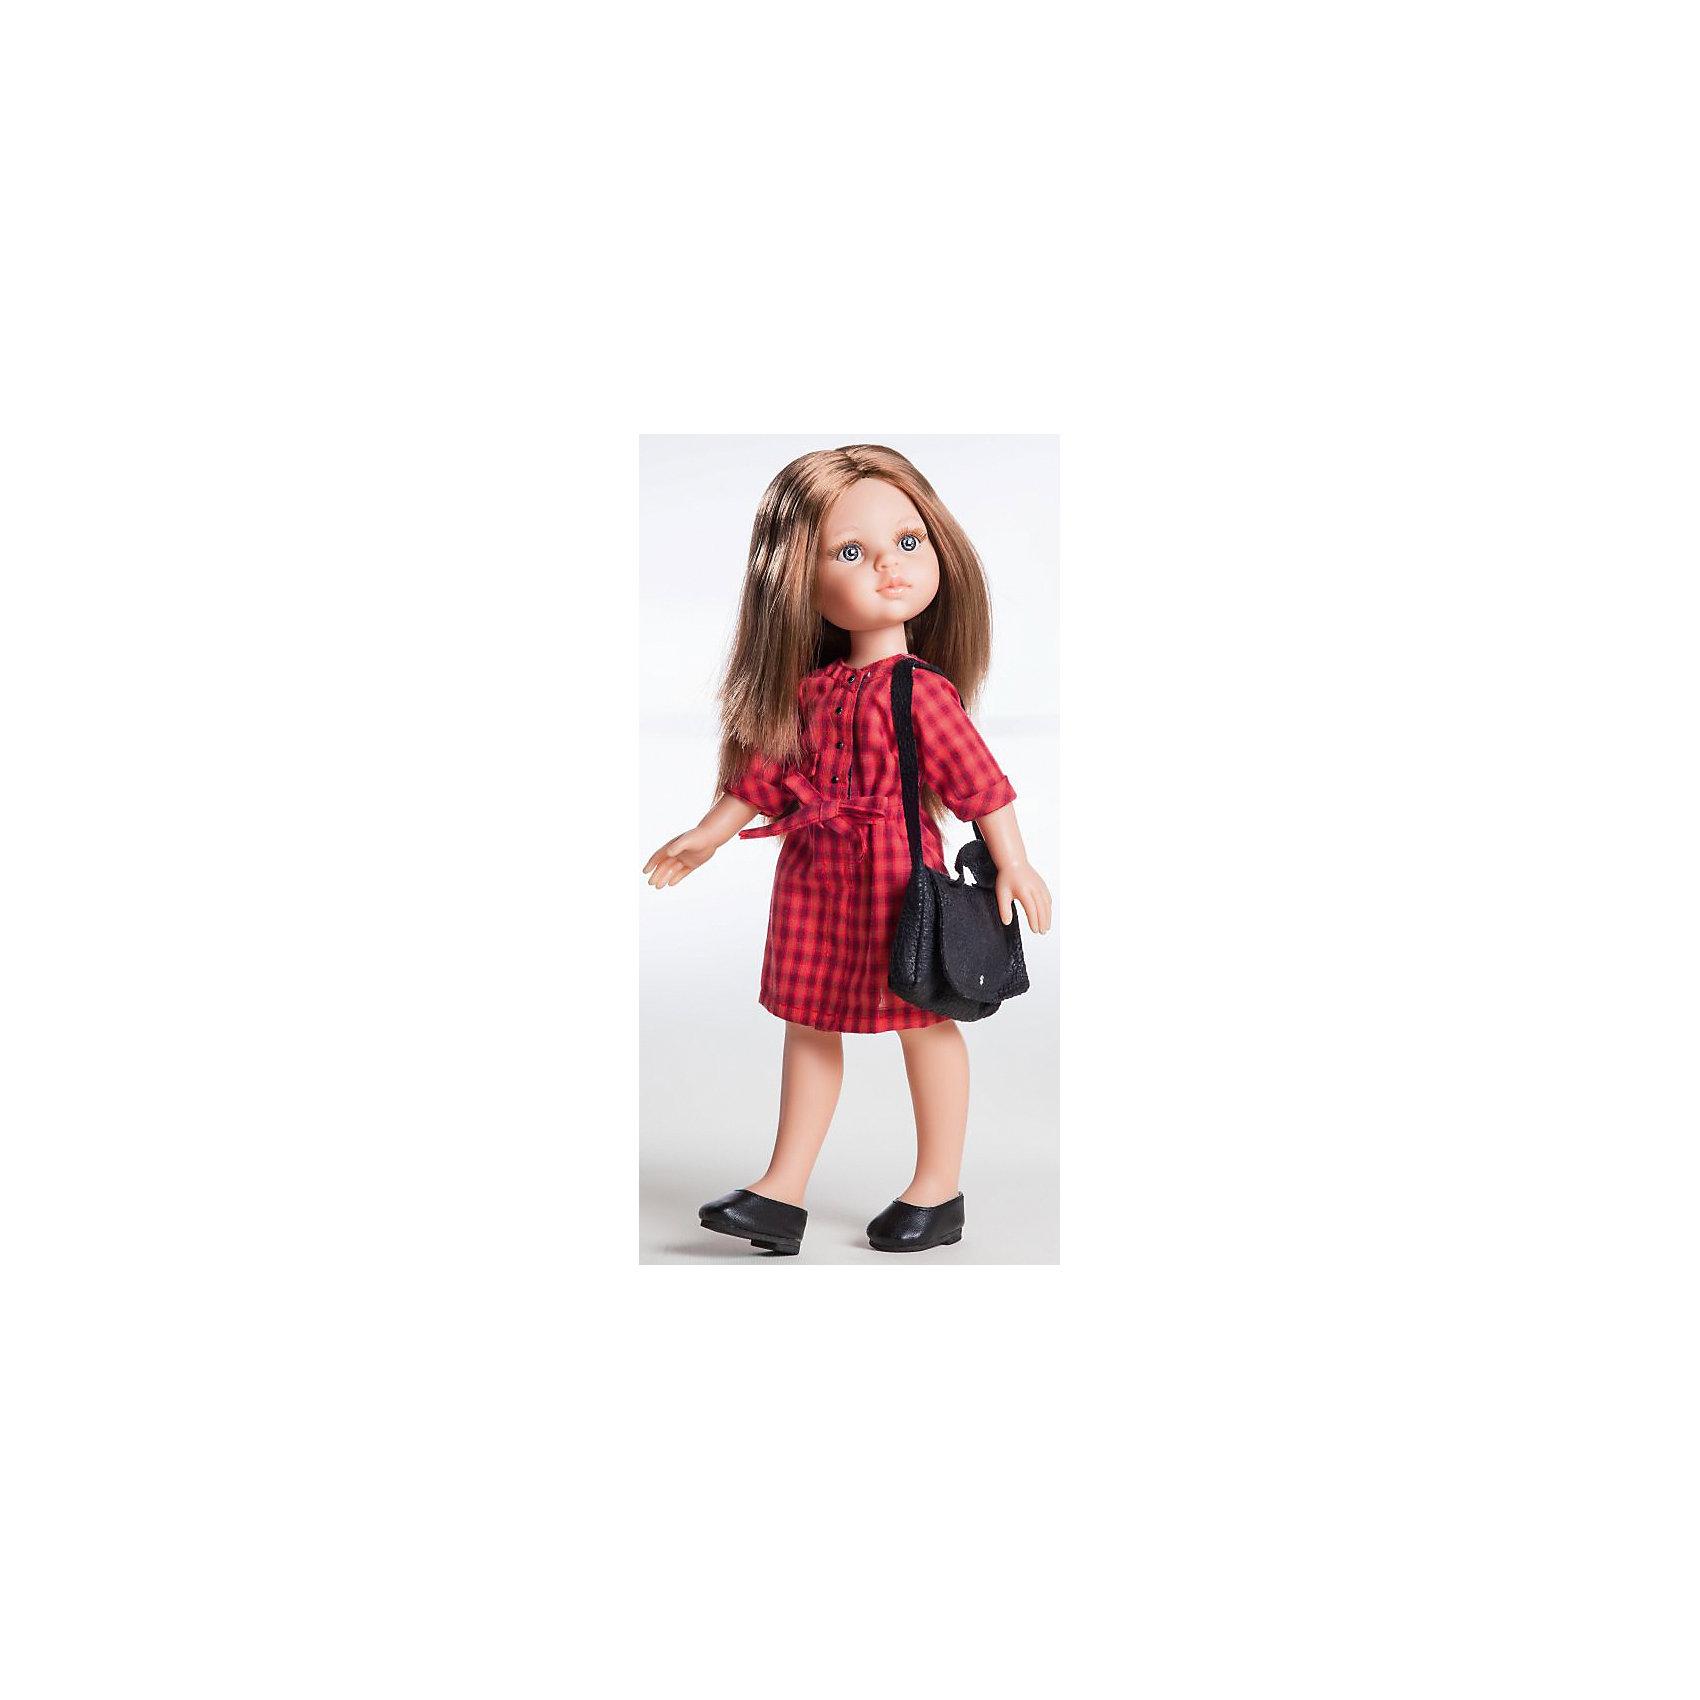 Paola Reina Кукла Кэрол, 32 см paola reina кукла клэр 32 см paola reina